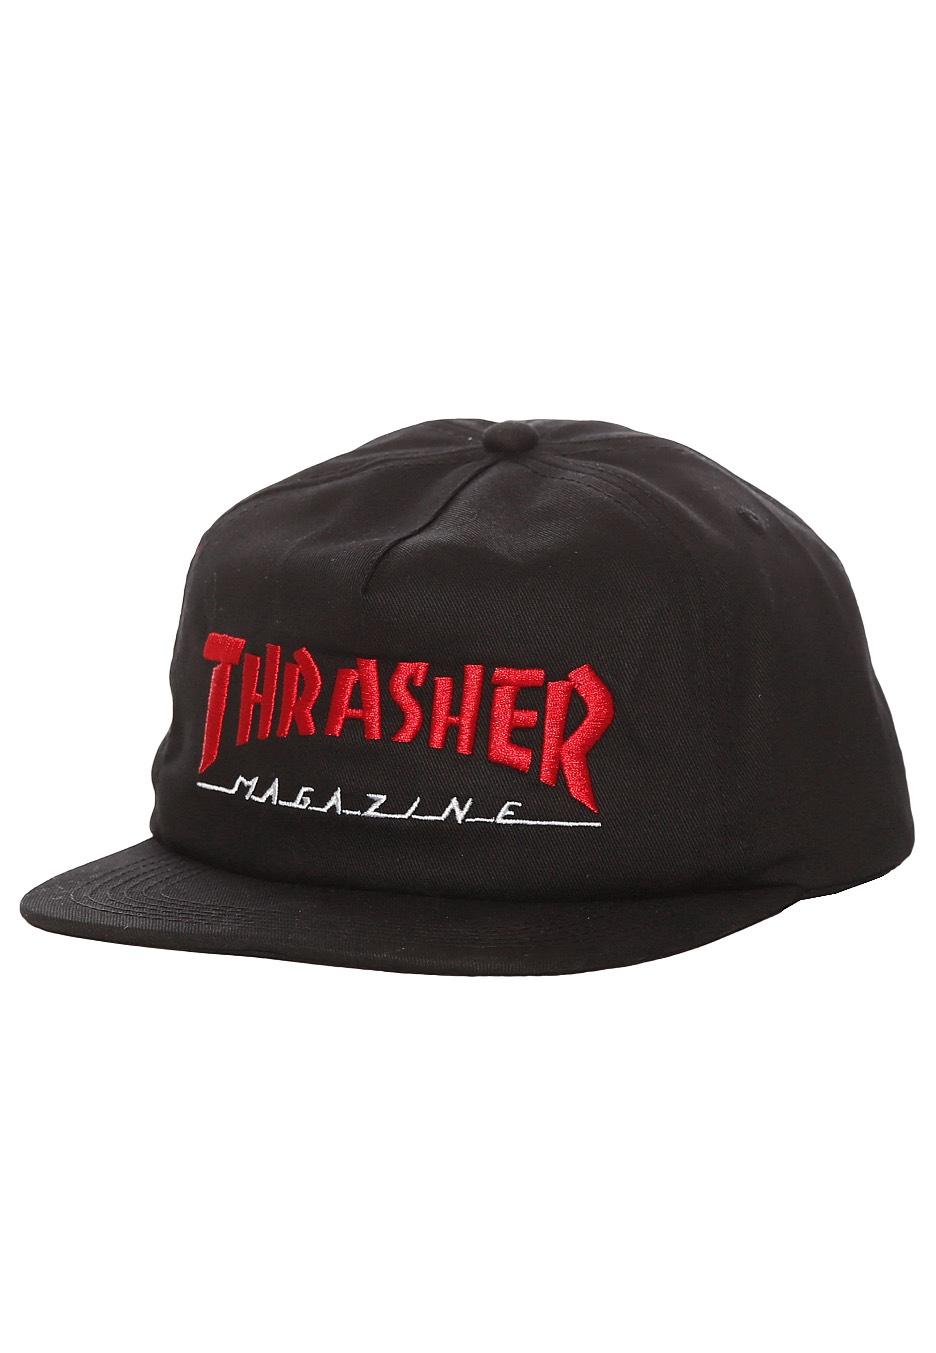 01cd3f738c0 Thrasher - Magazine Logo Two-Tone Black Red - Cap - Streetwear Shop -  Impericon.com UK